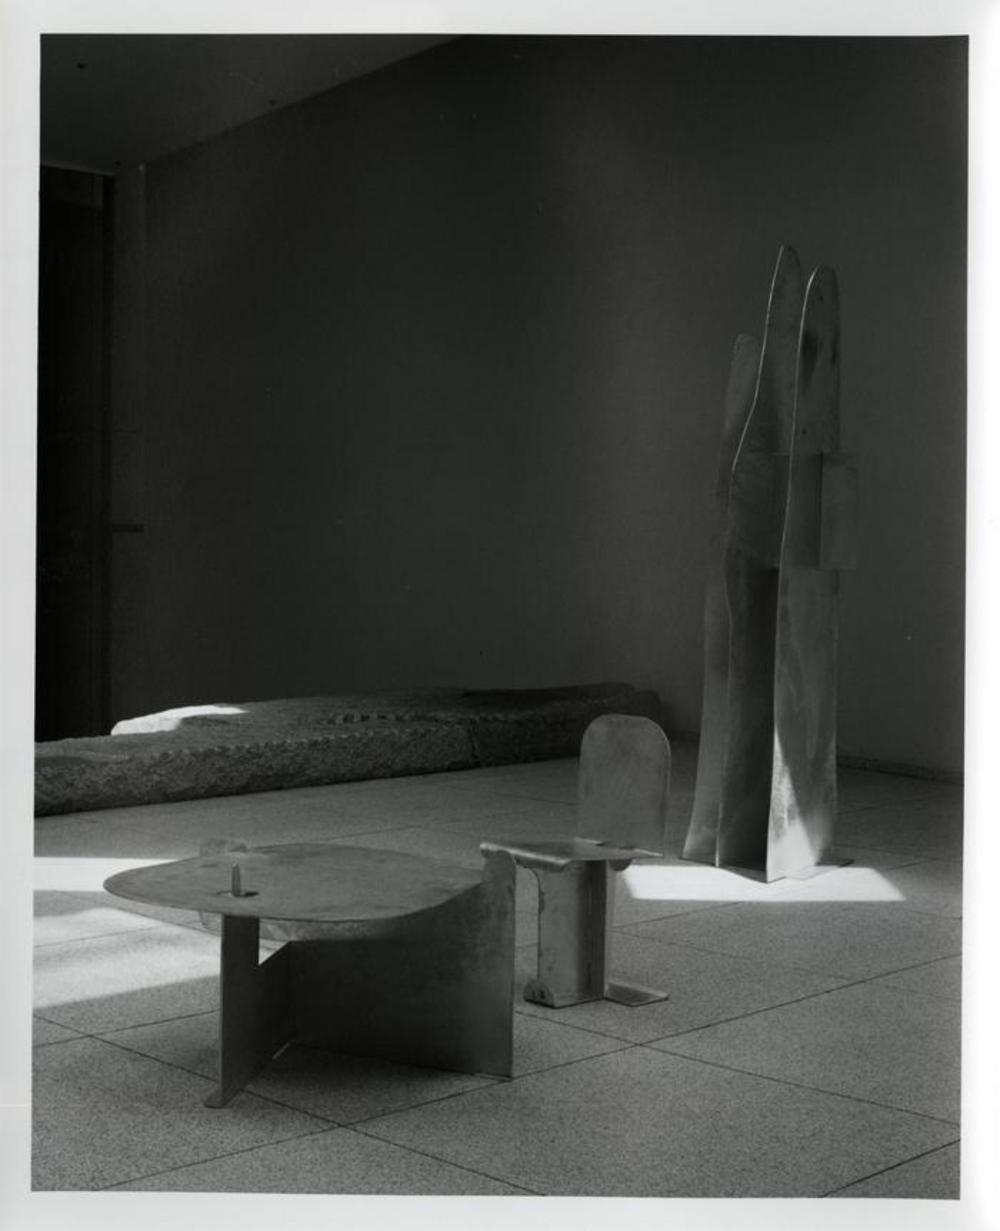 Pierced Seat, image 8